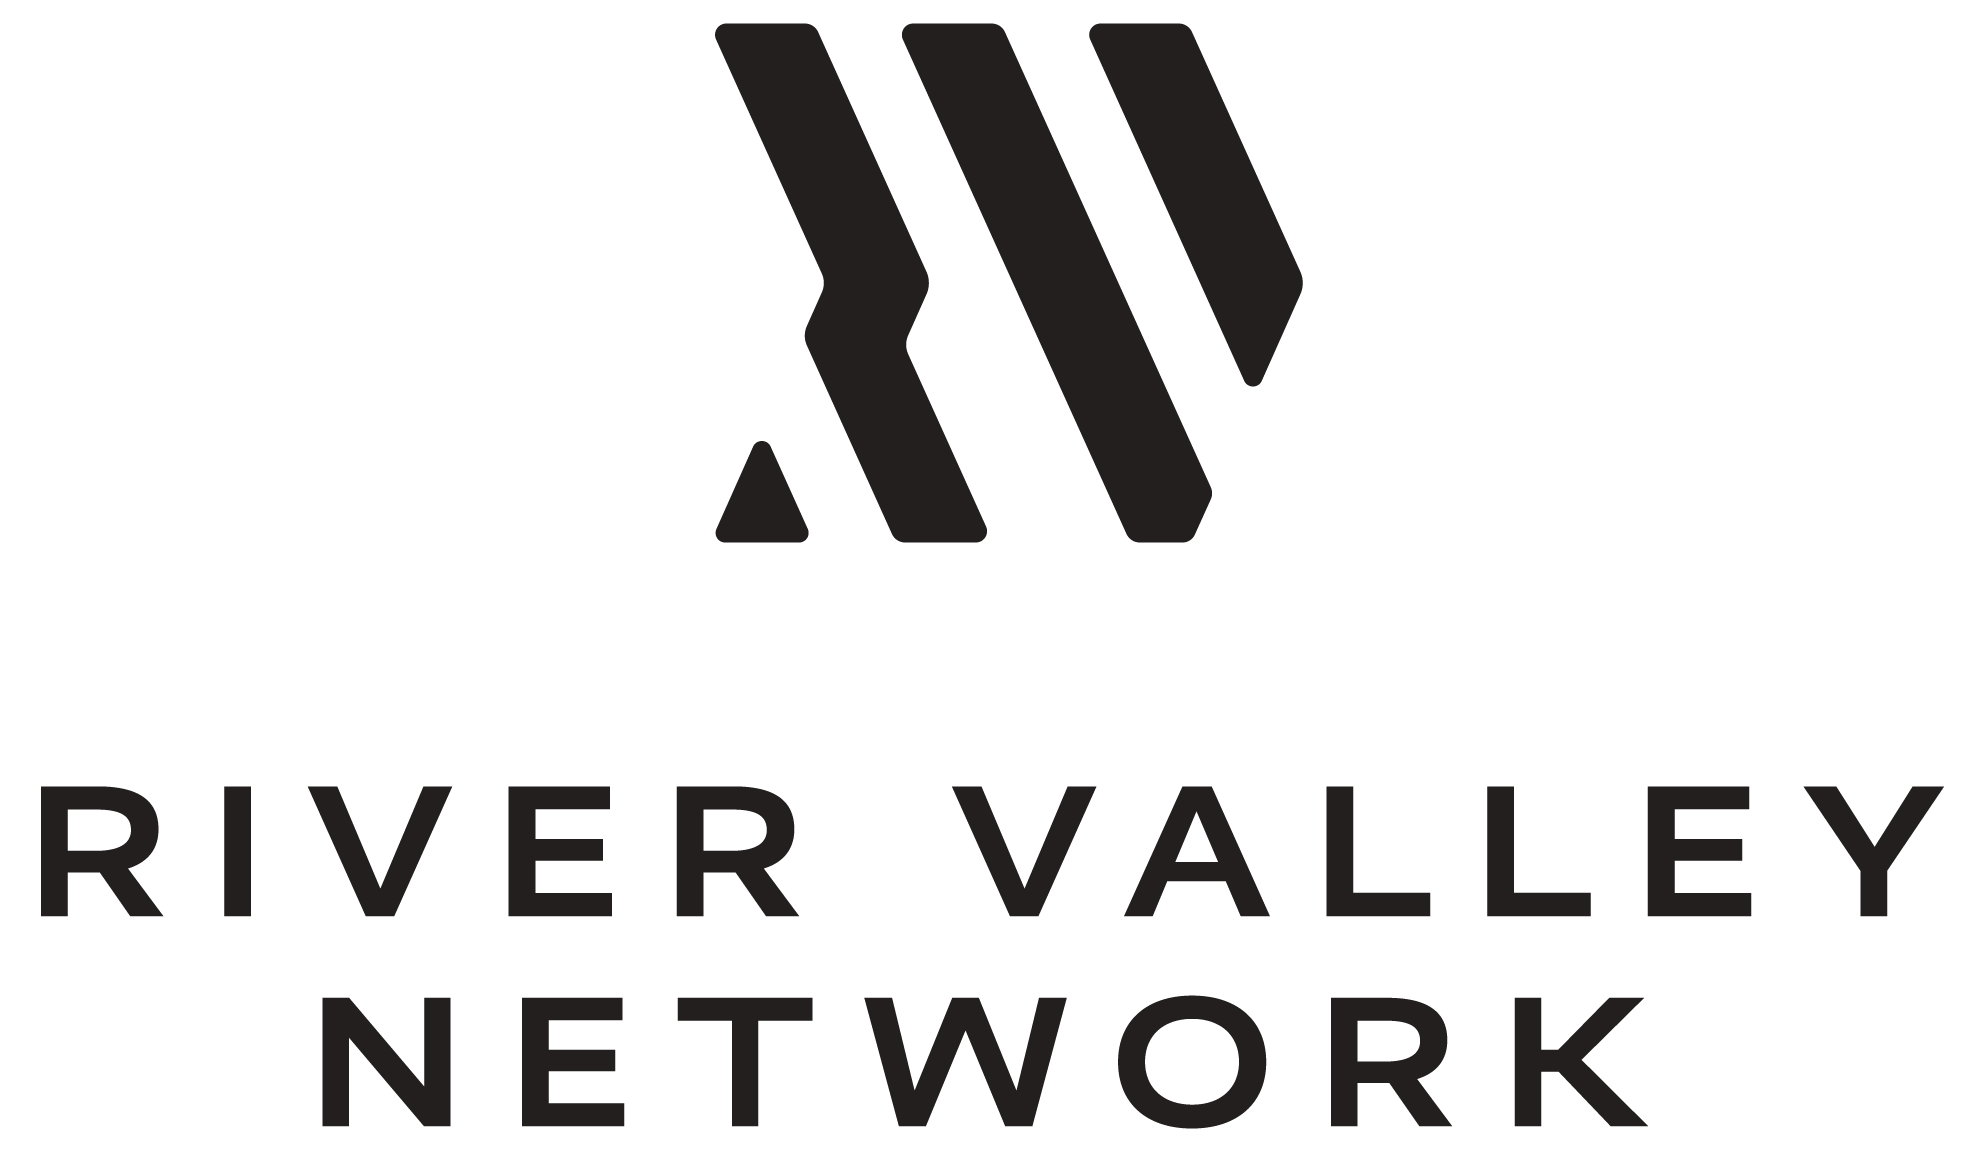 Rvn logo fullcolor